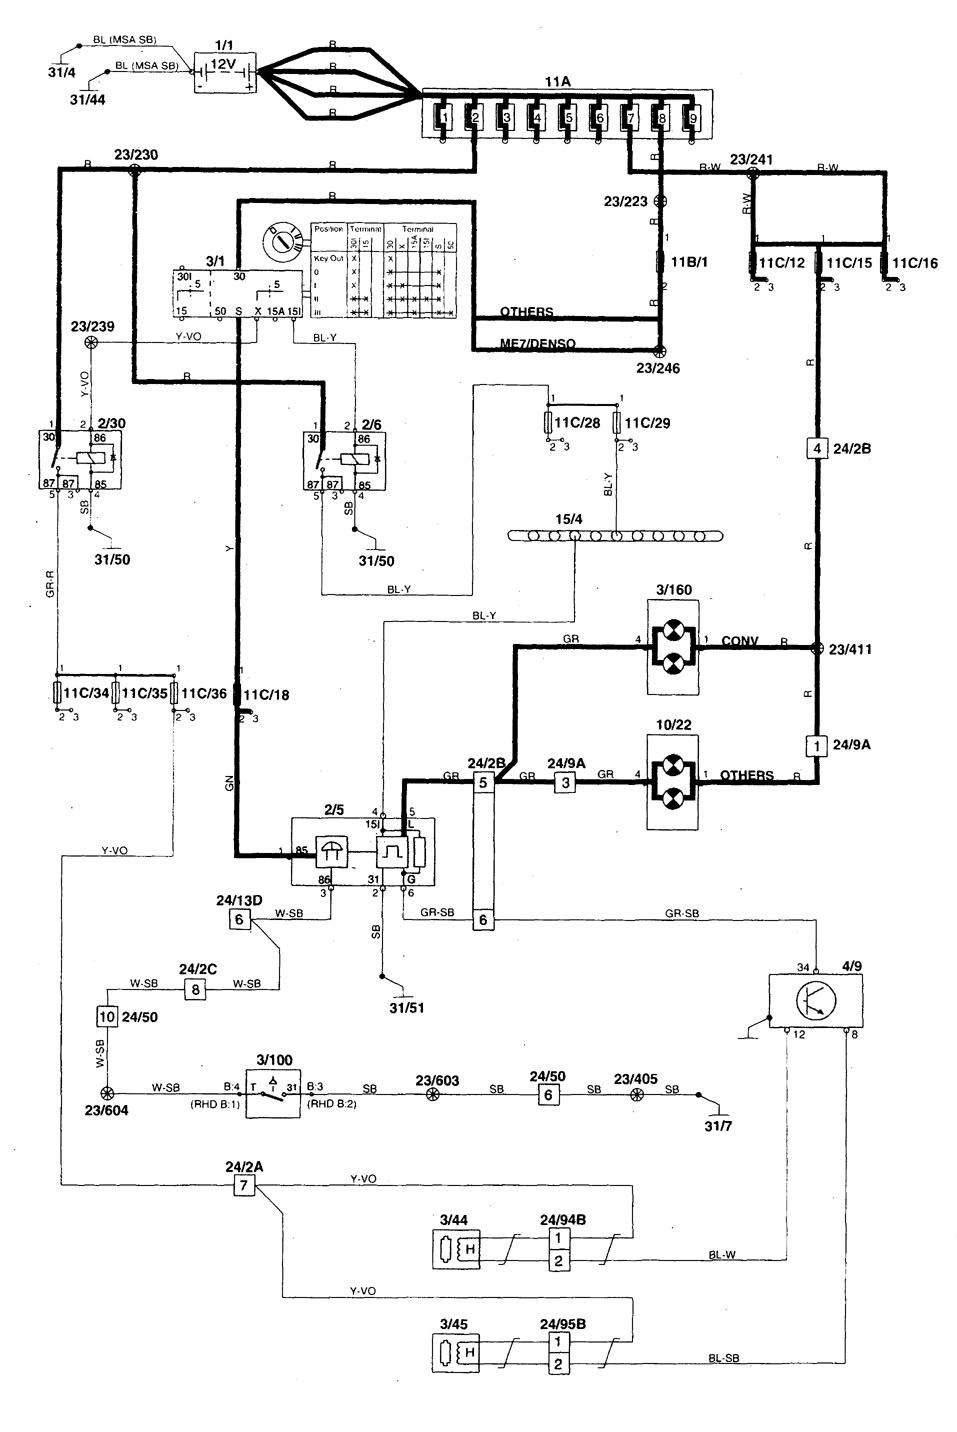 Volvo V70 Wiring Diagram 1999 - Data Wiring Diagrams •